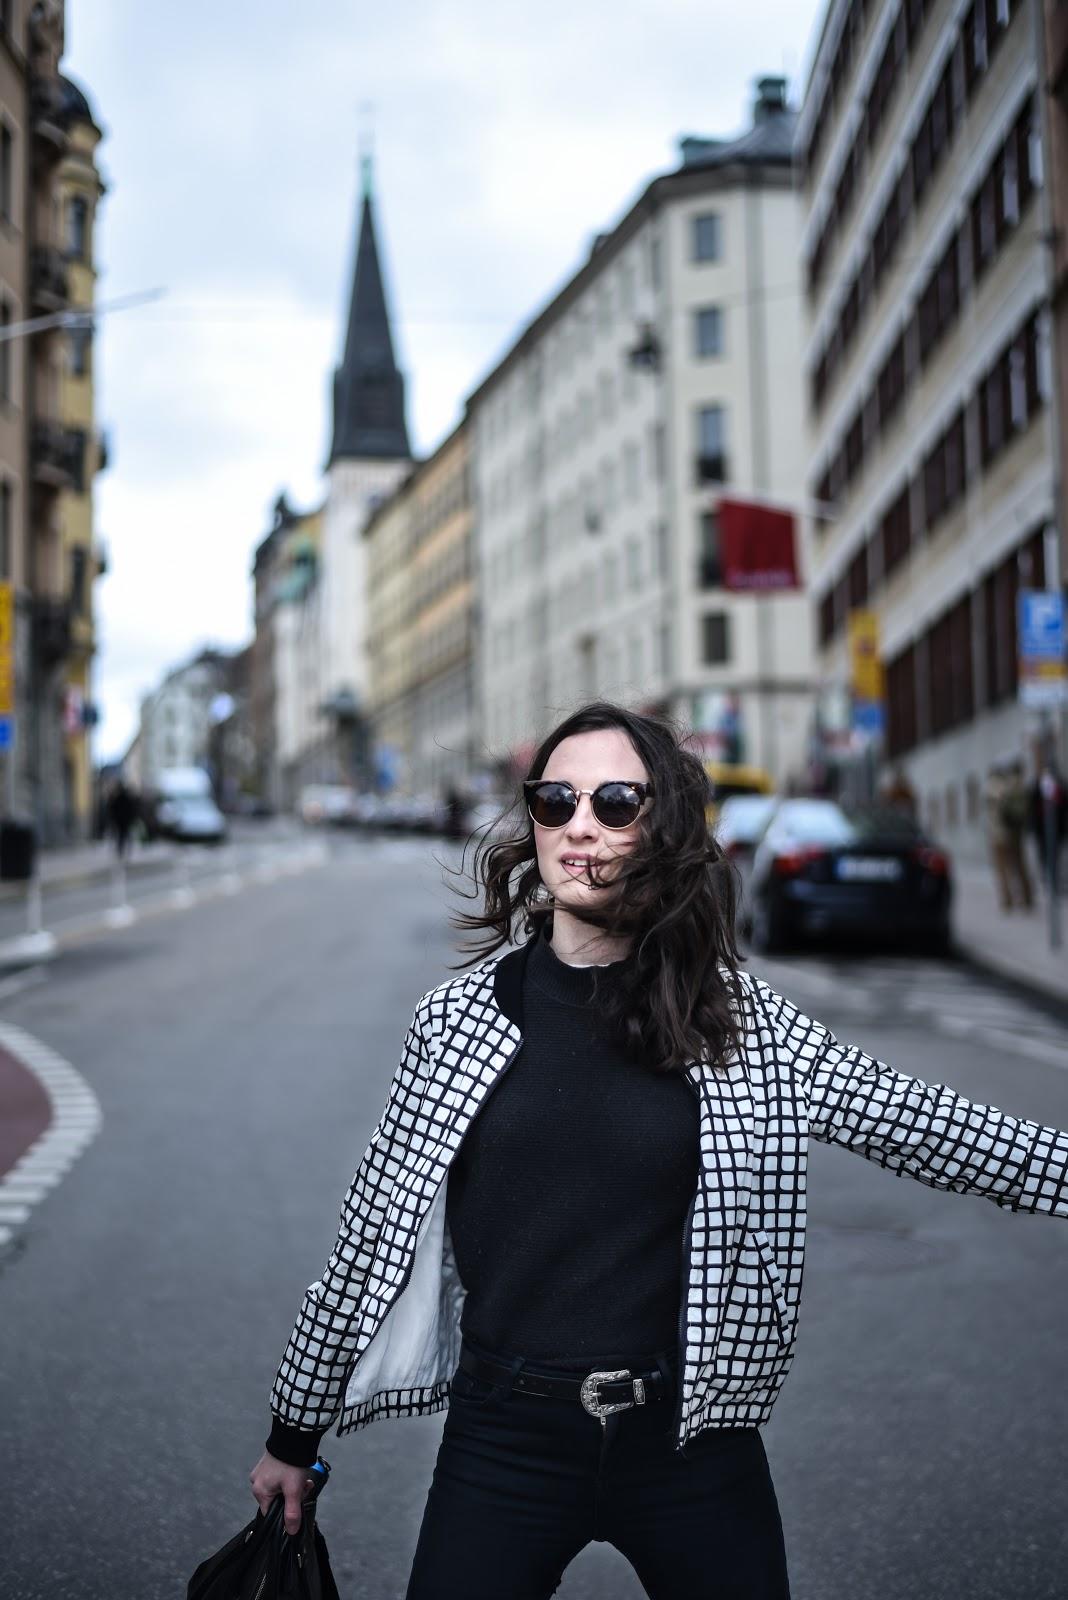 bomber_jacket_stockholm_street_style_travel_look